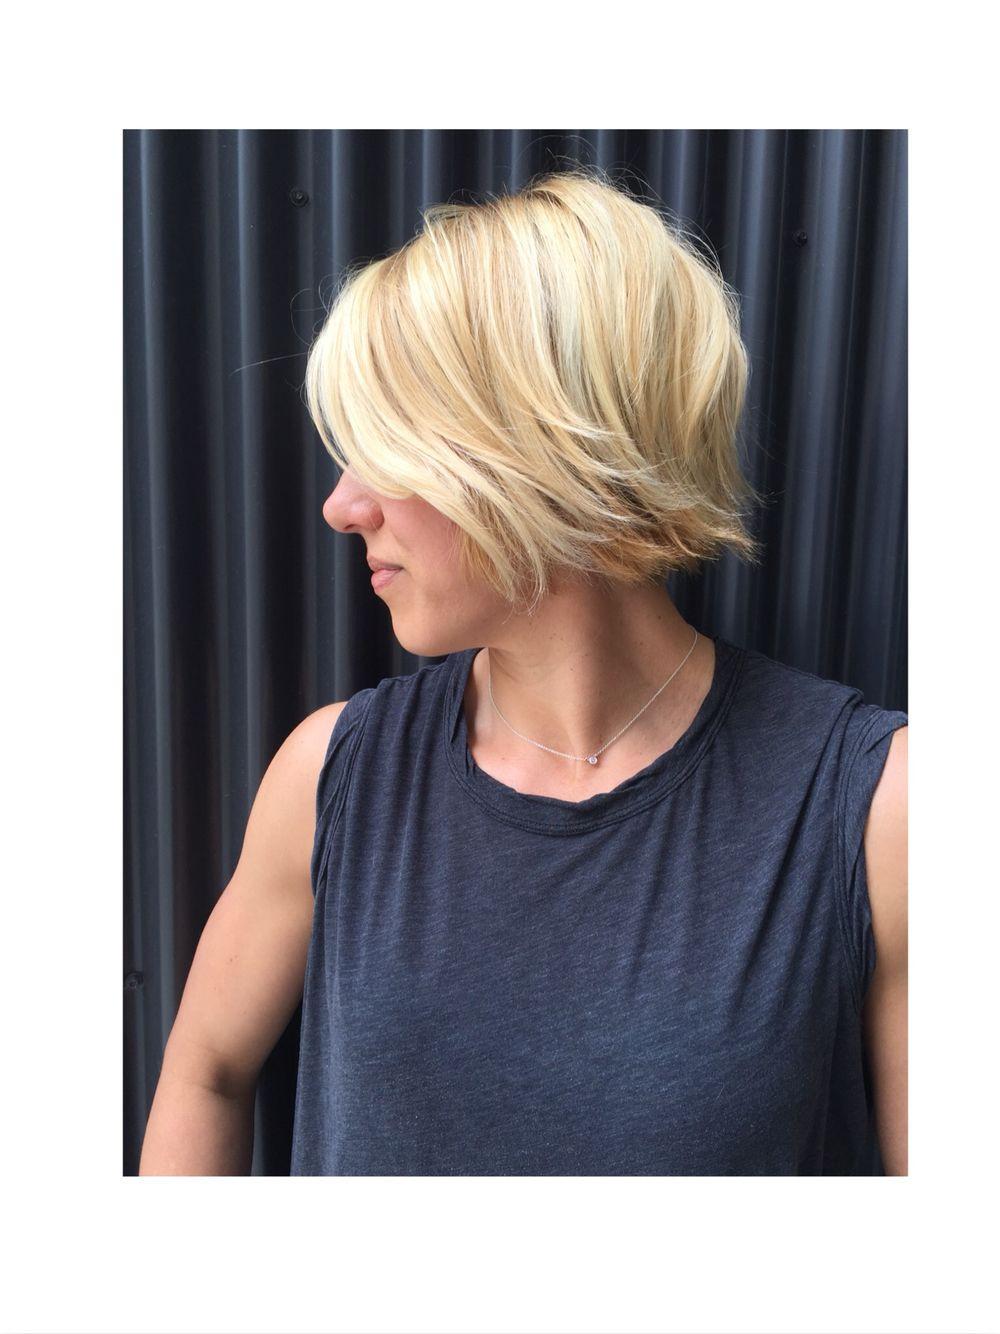 Kids Haircuts Denver  Short hair by Liz Burns denver shorthair short hair for